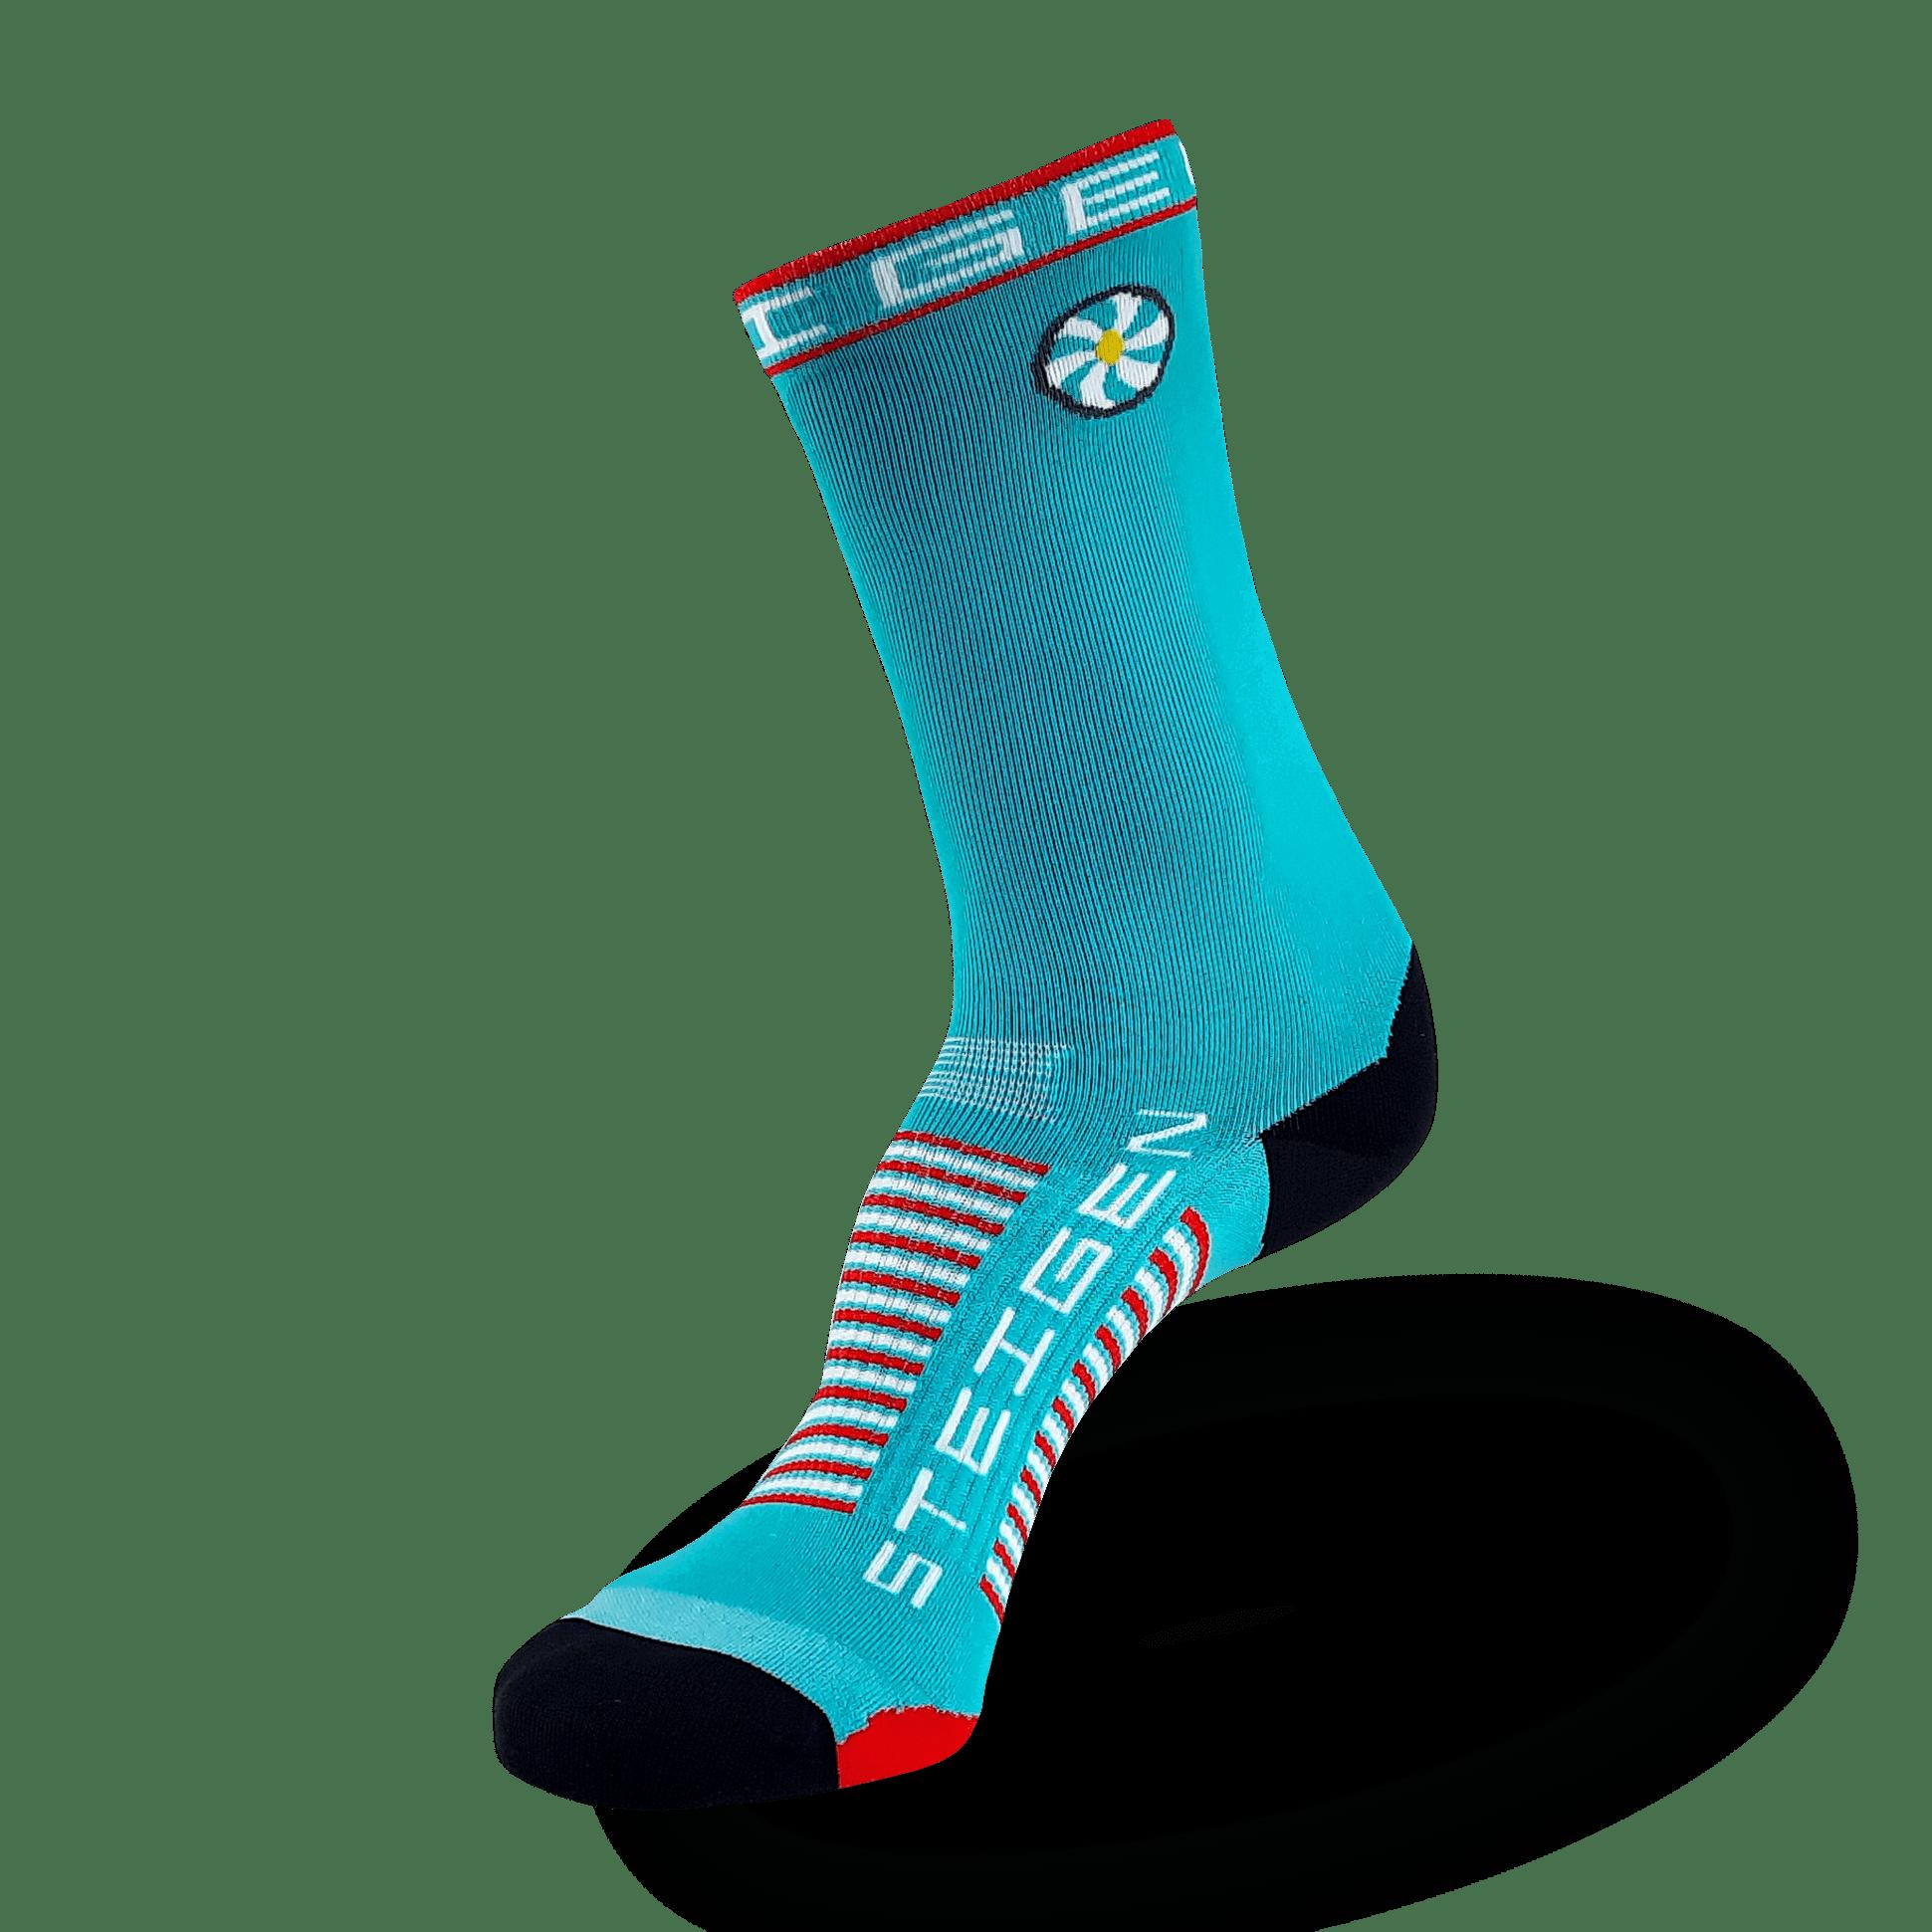 Aqua Blue Running Socks ¾ Length